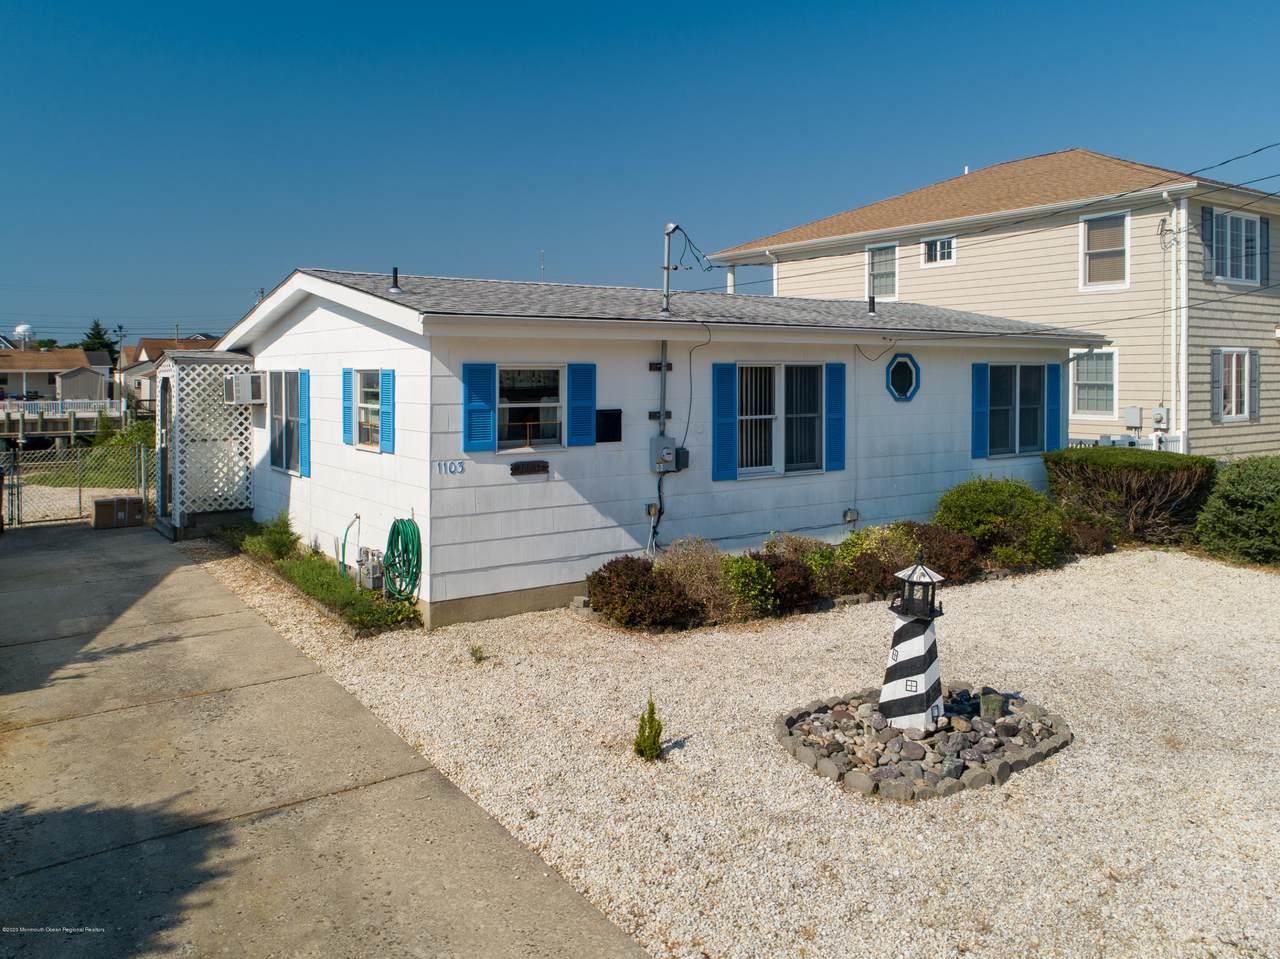 1103 Beach Haven West Boulevard - Photo 1